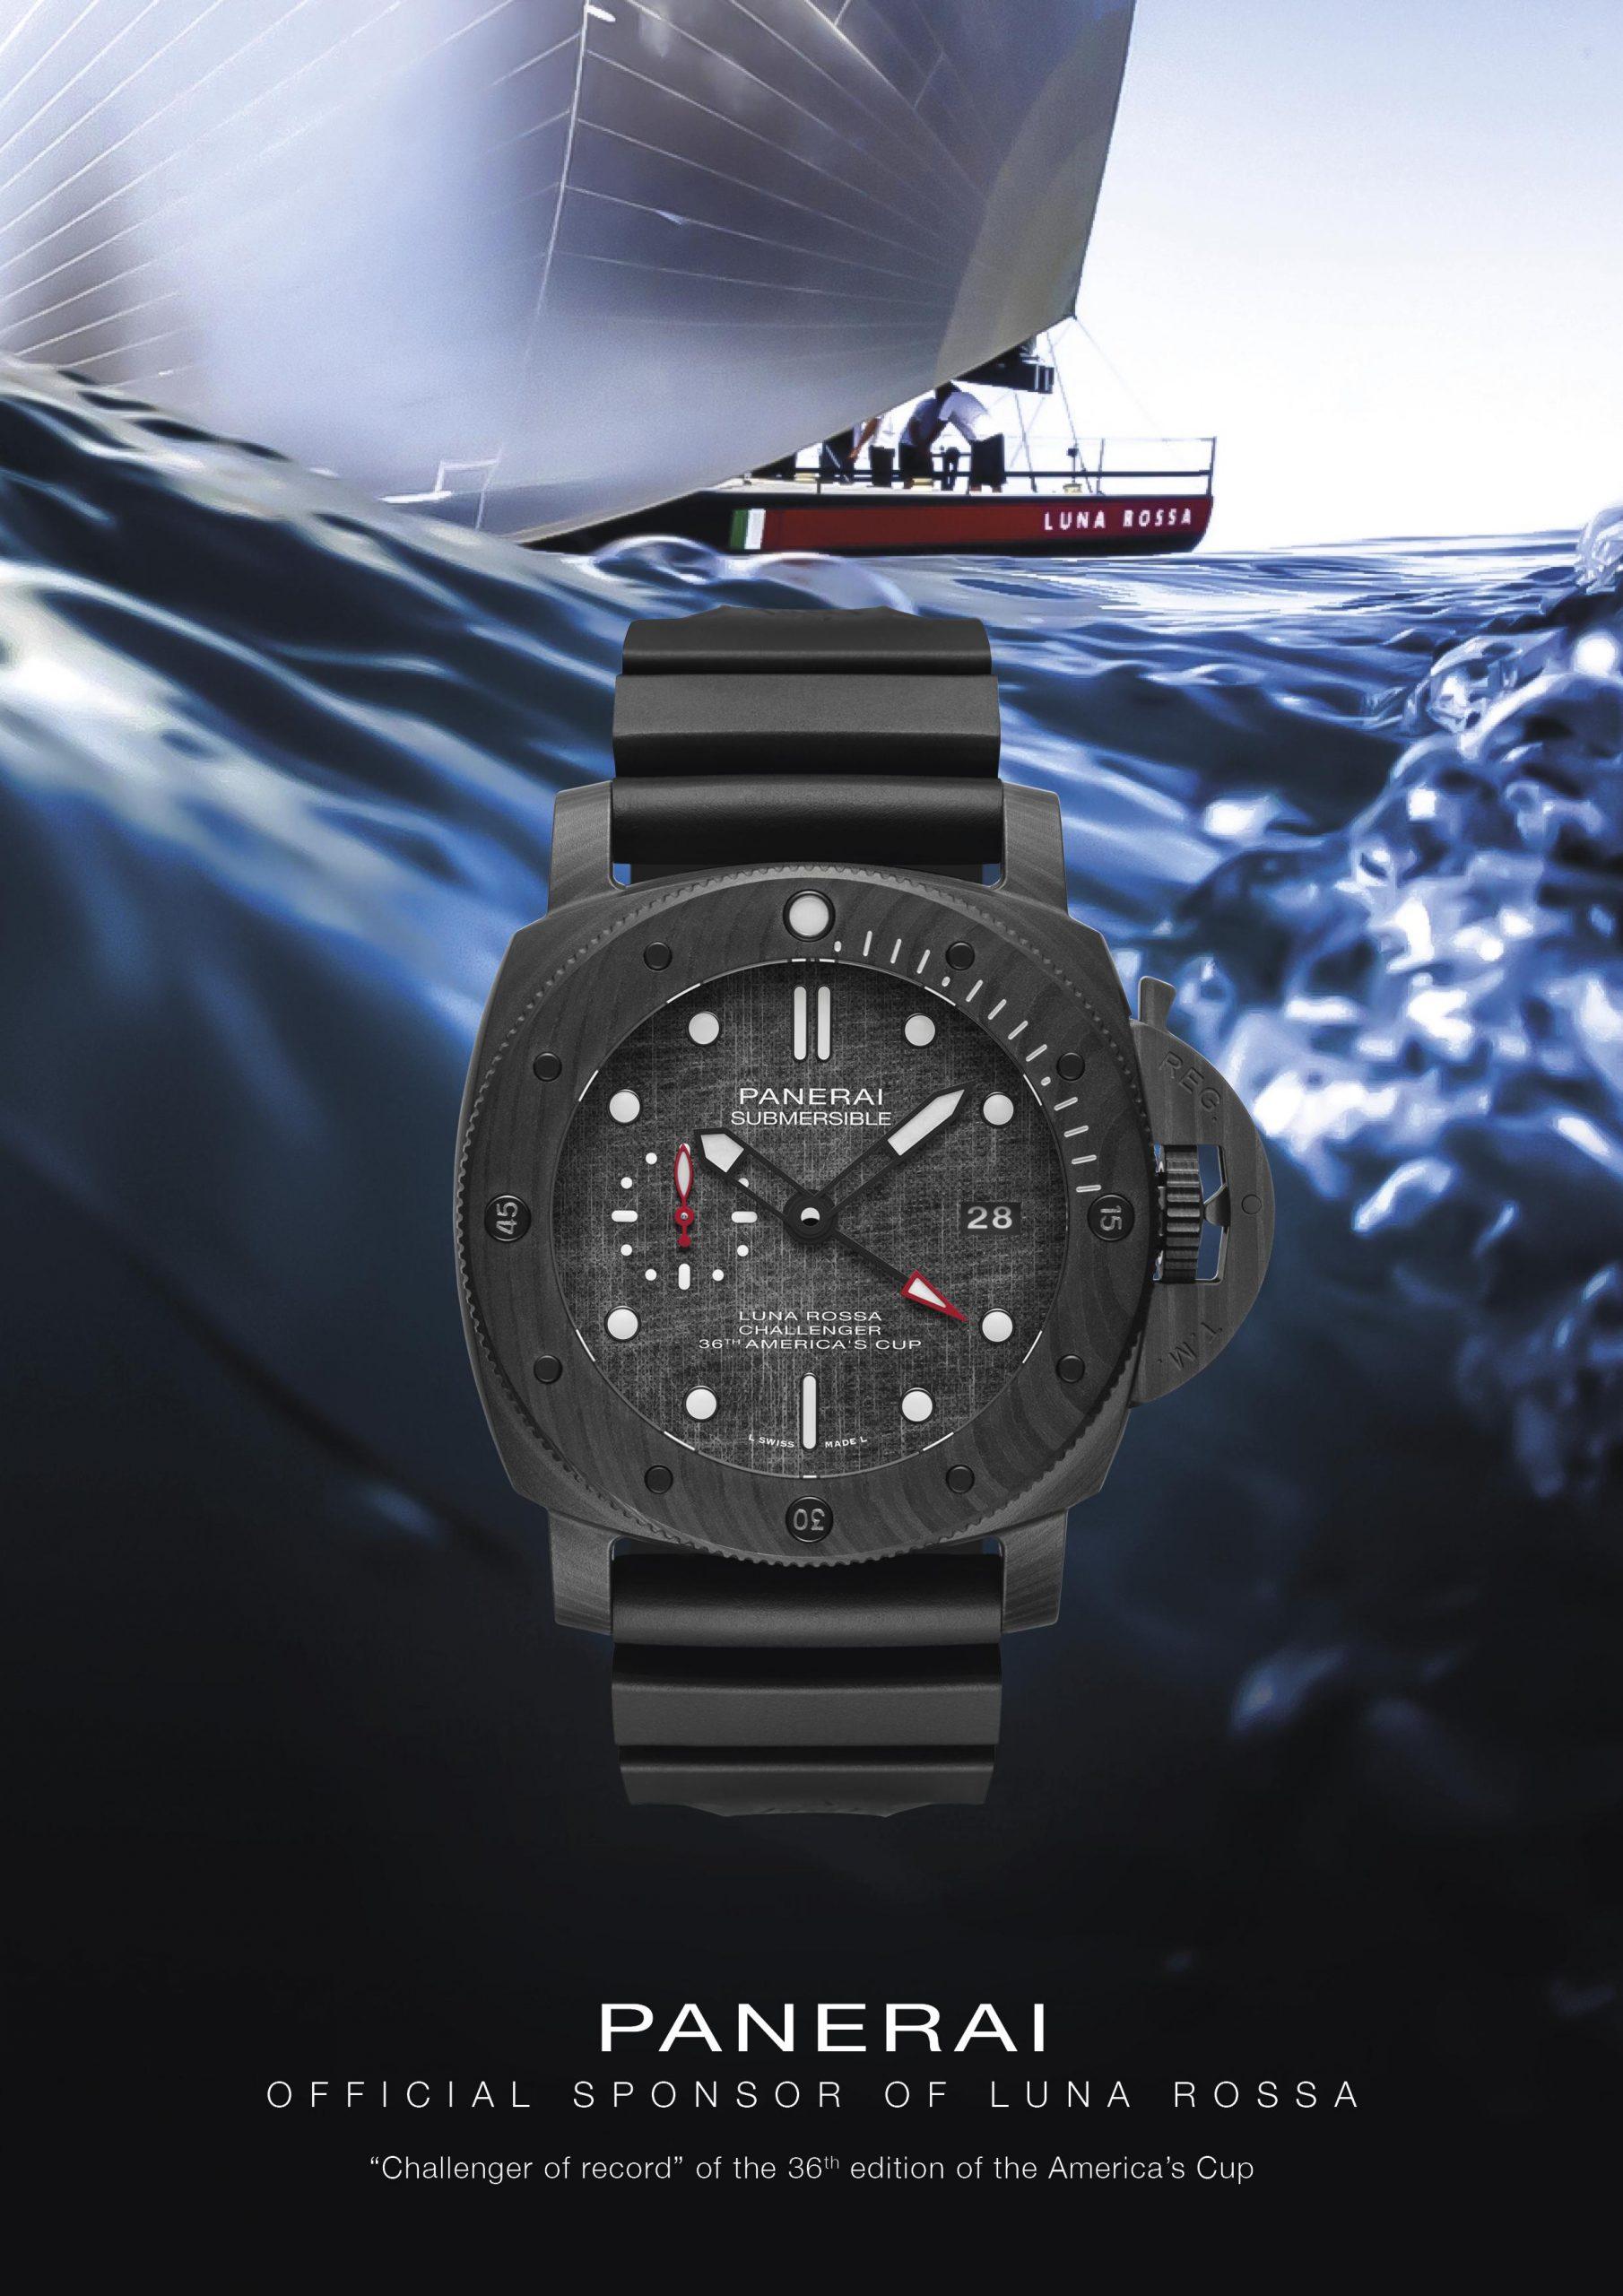 Panerai Submersible Luna Rossa - boat shopping